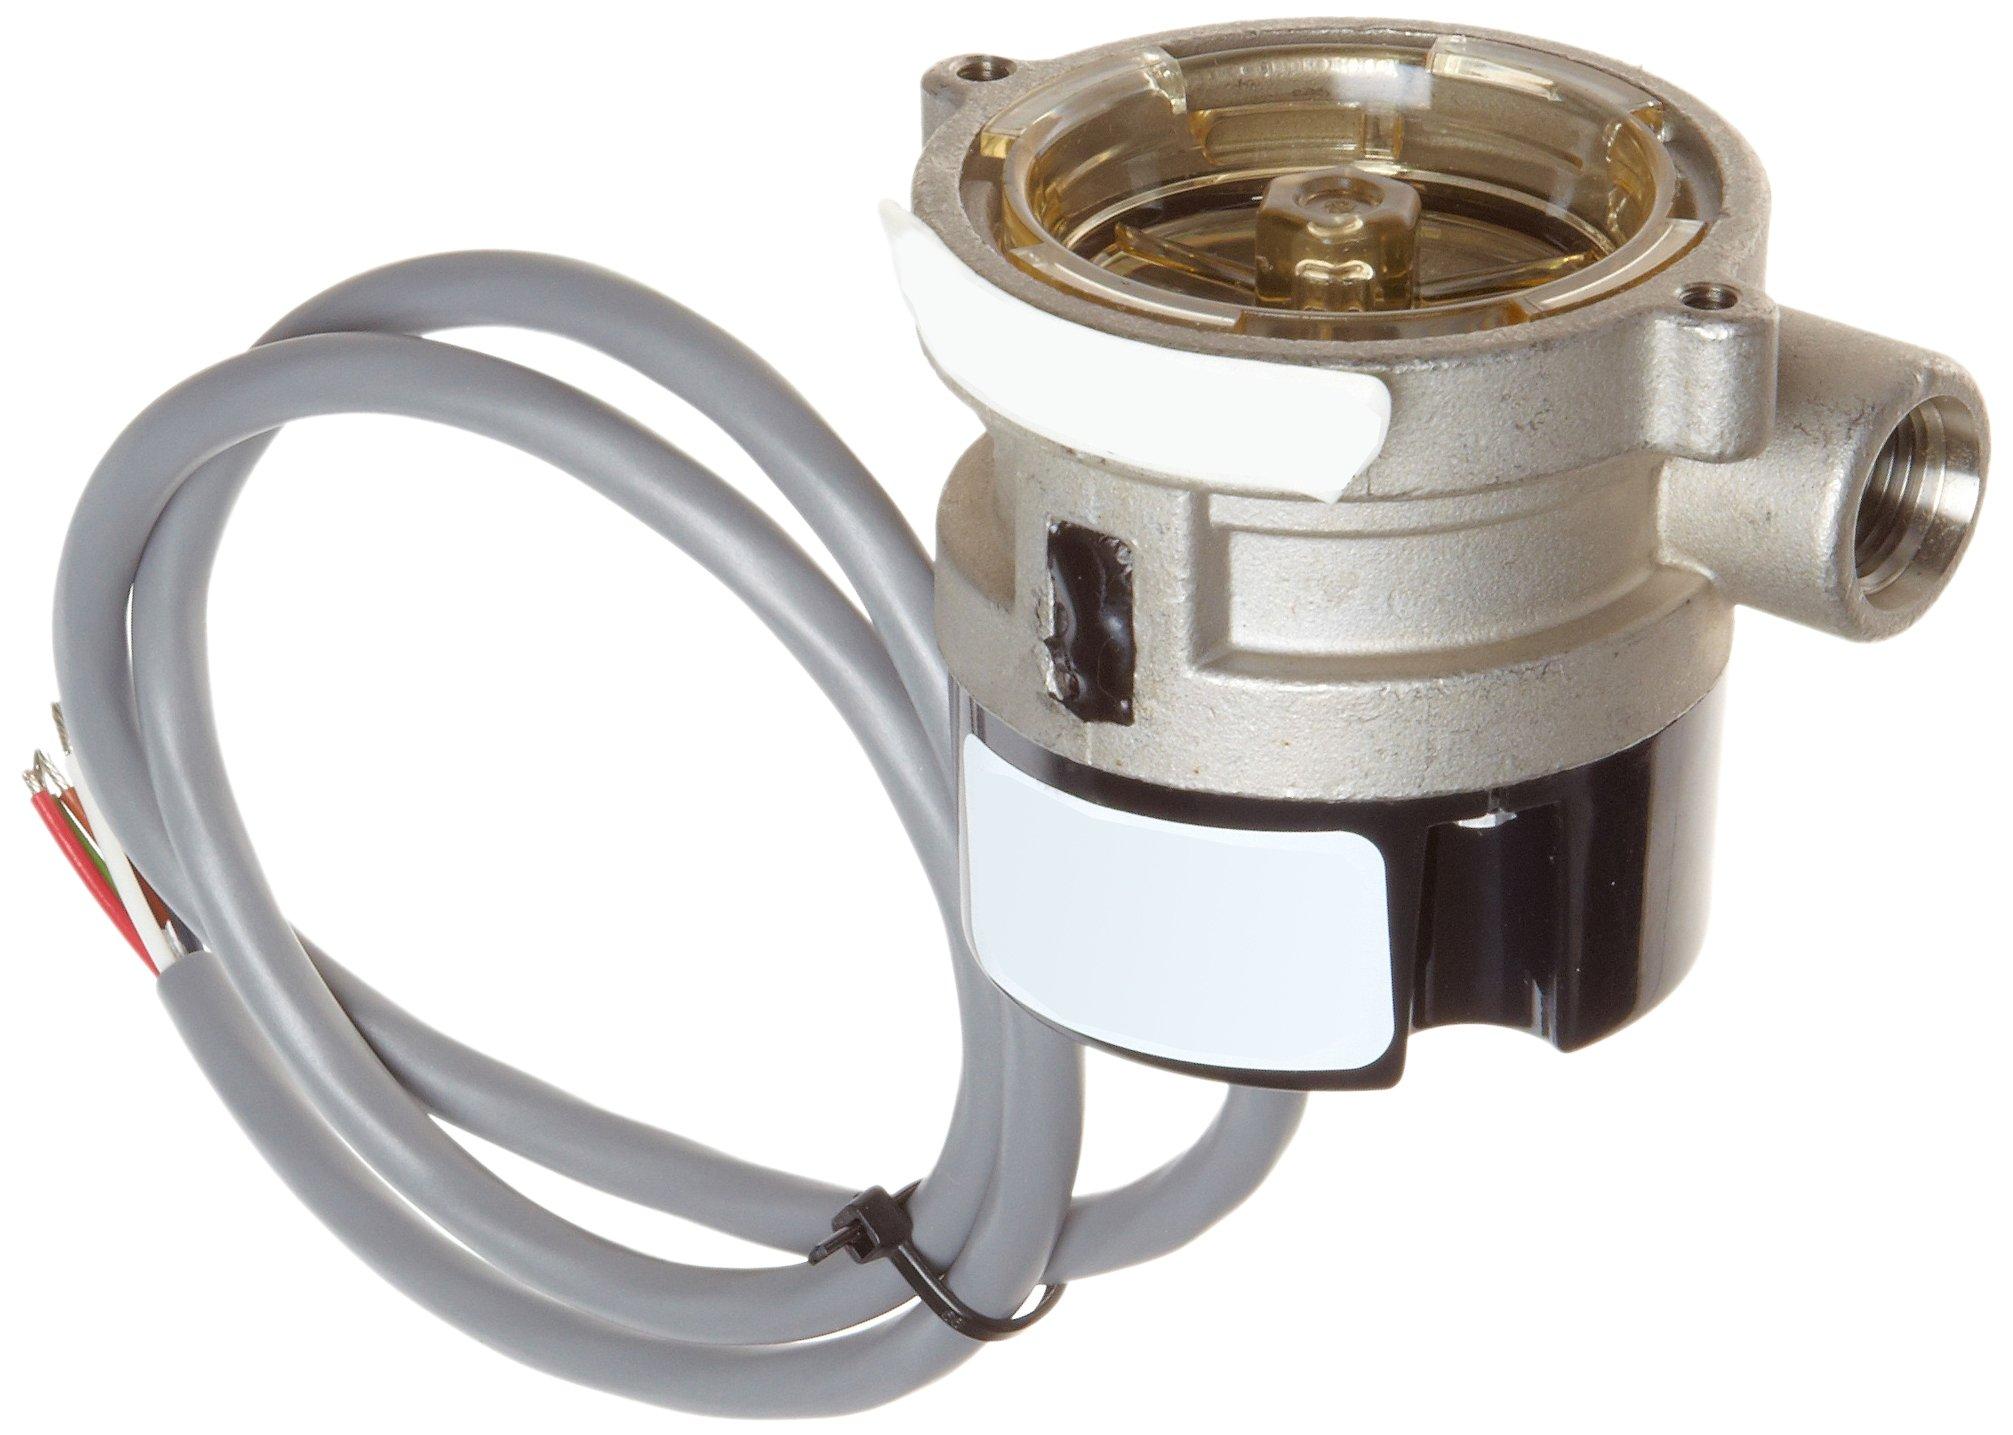 Gems Sensors RFS Series Stainless Steel 316 Flow Sensor Switch, Inline, Rotor Type, 24 VDC Input, 0.1-5.0 gpm Flow Setting Adjustment Range, 9/16''-18 Straight Thread